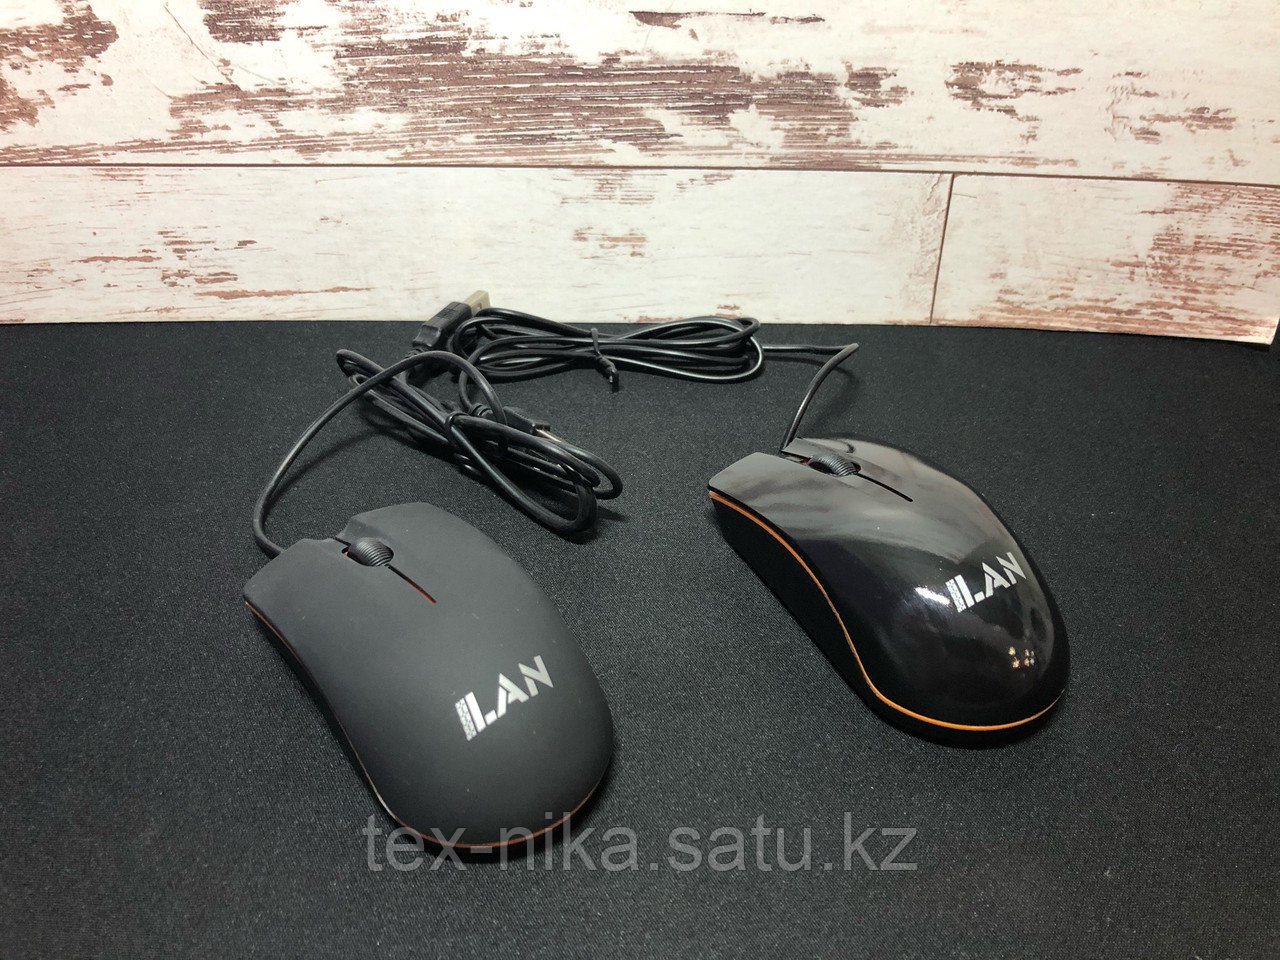 Мышь проводная Lan M-20